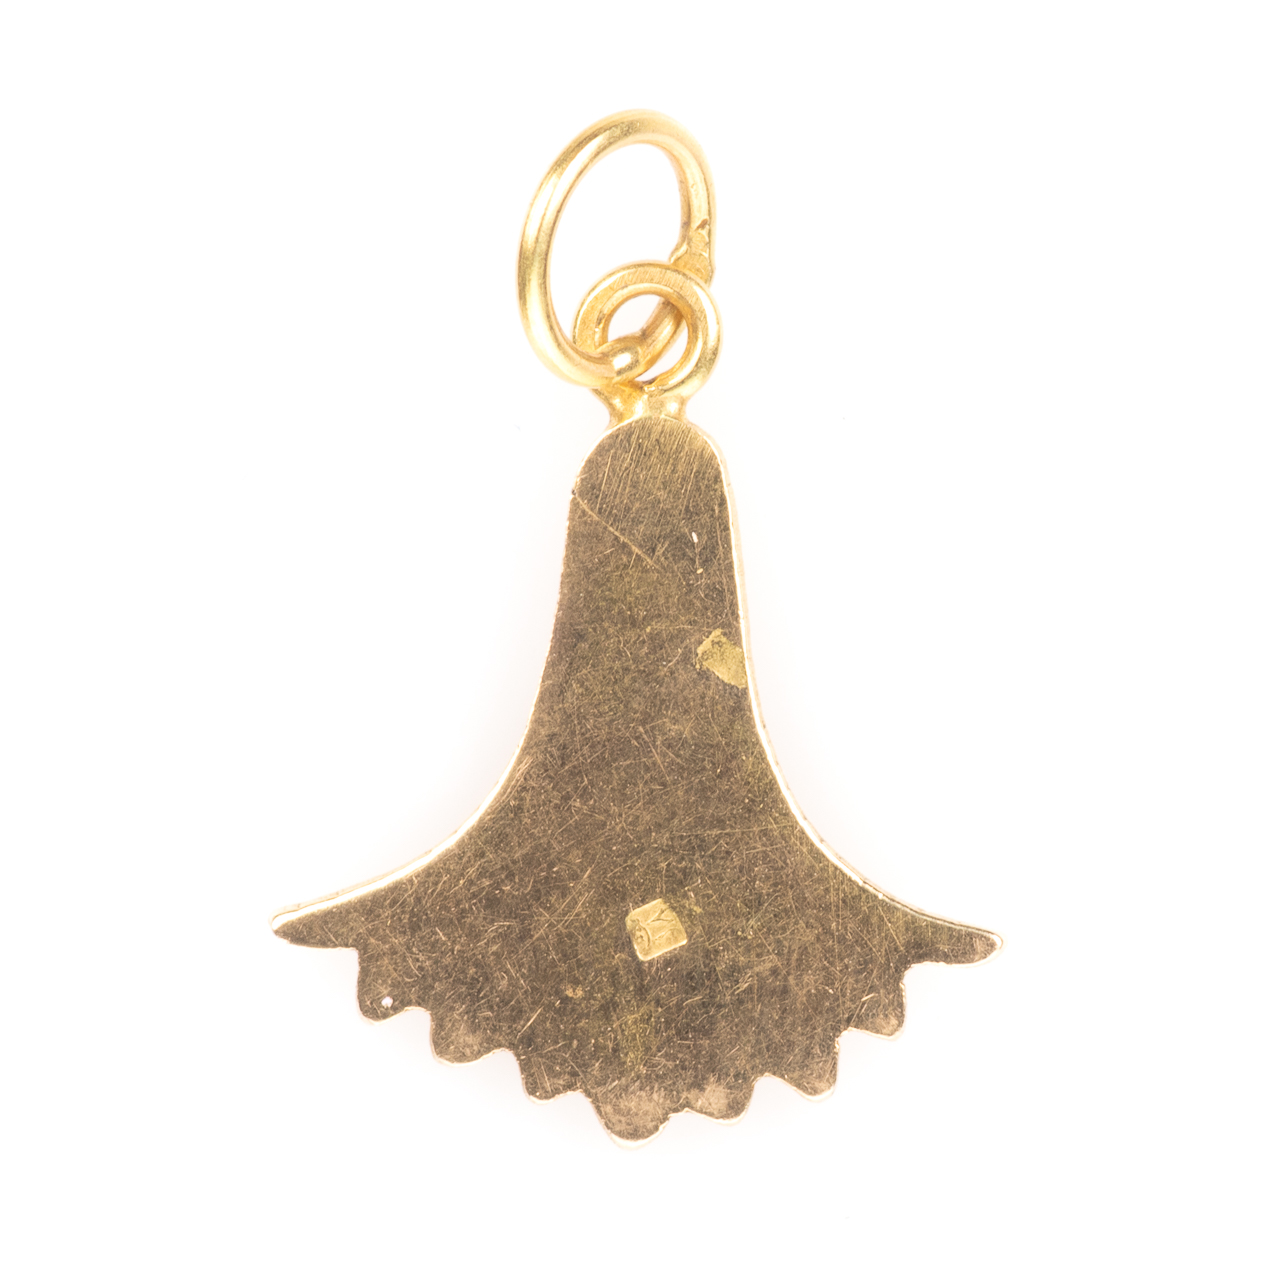 18ct Lotus Flower Pendant - Image 4 of 5